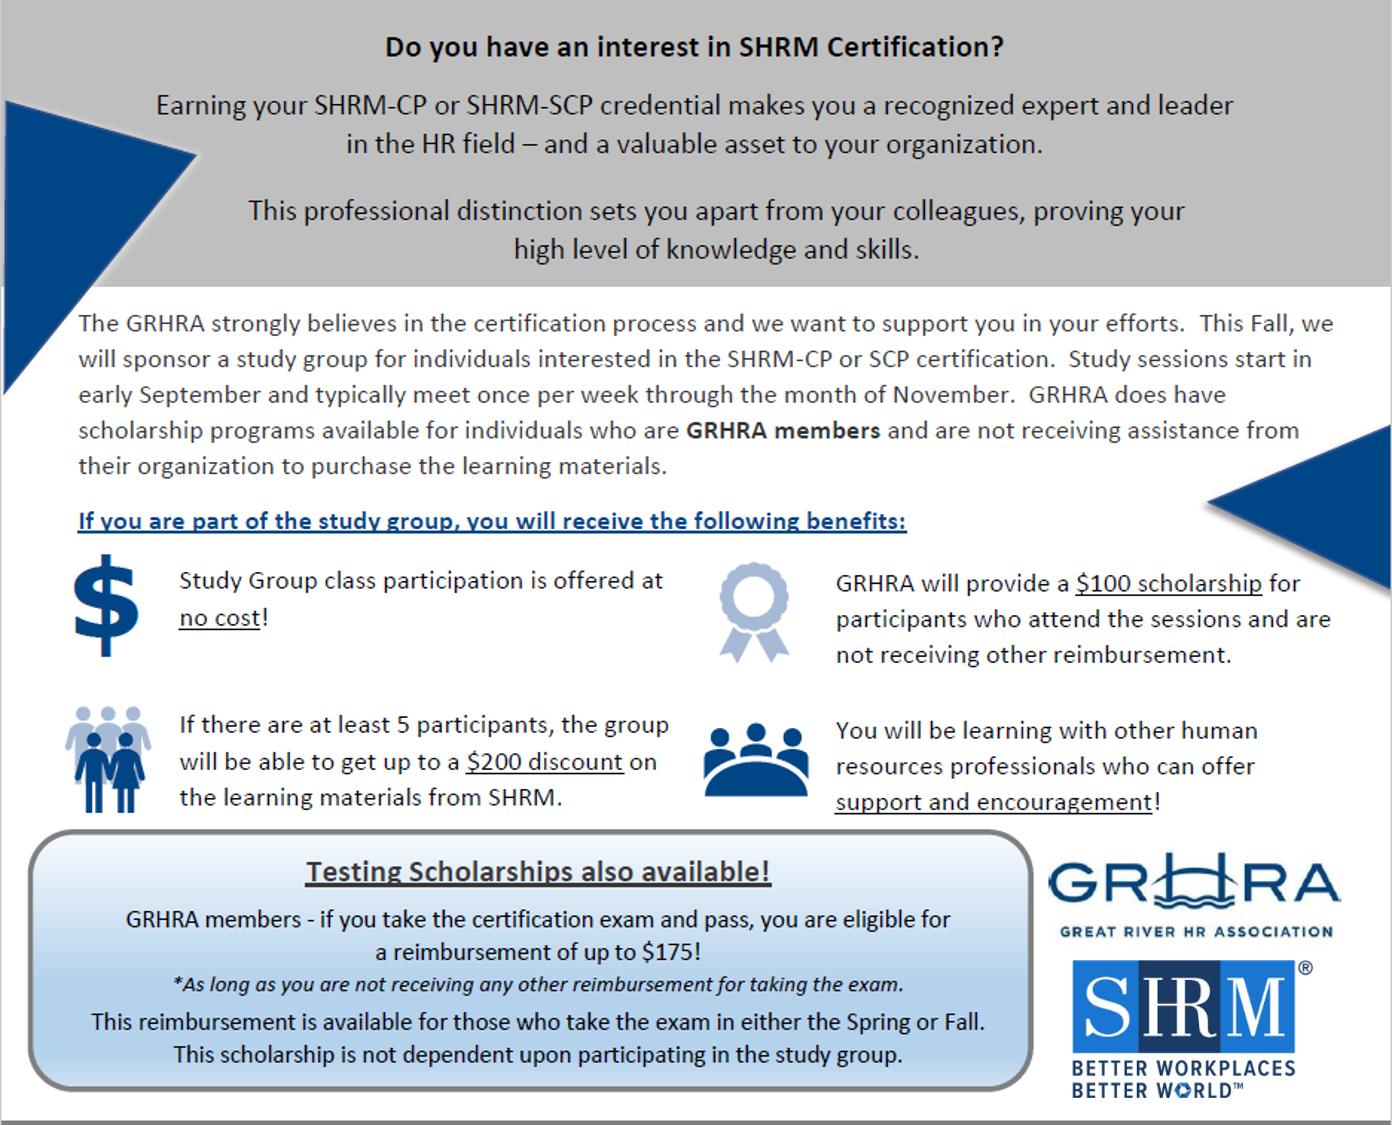 shrm-certification-2020-information